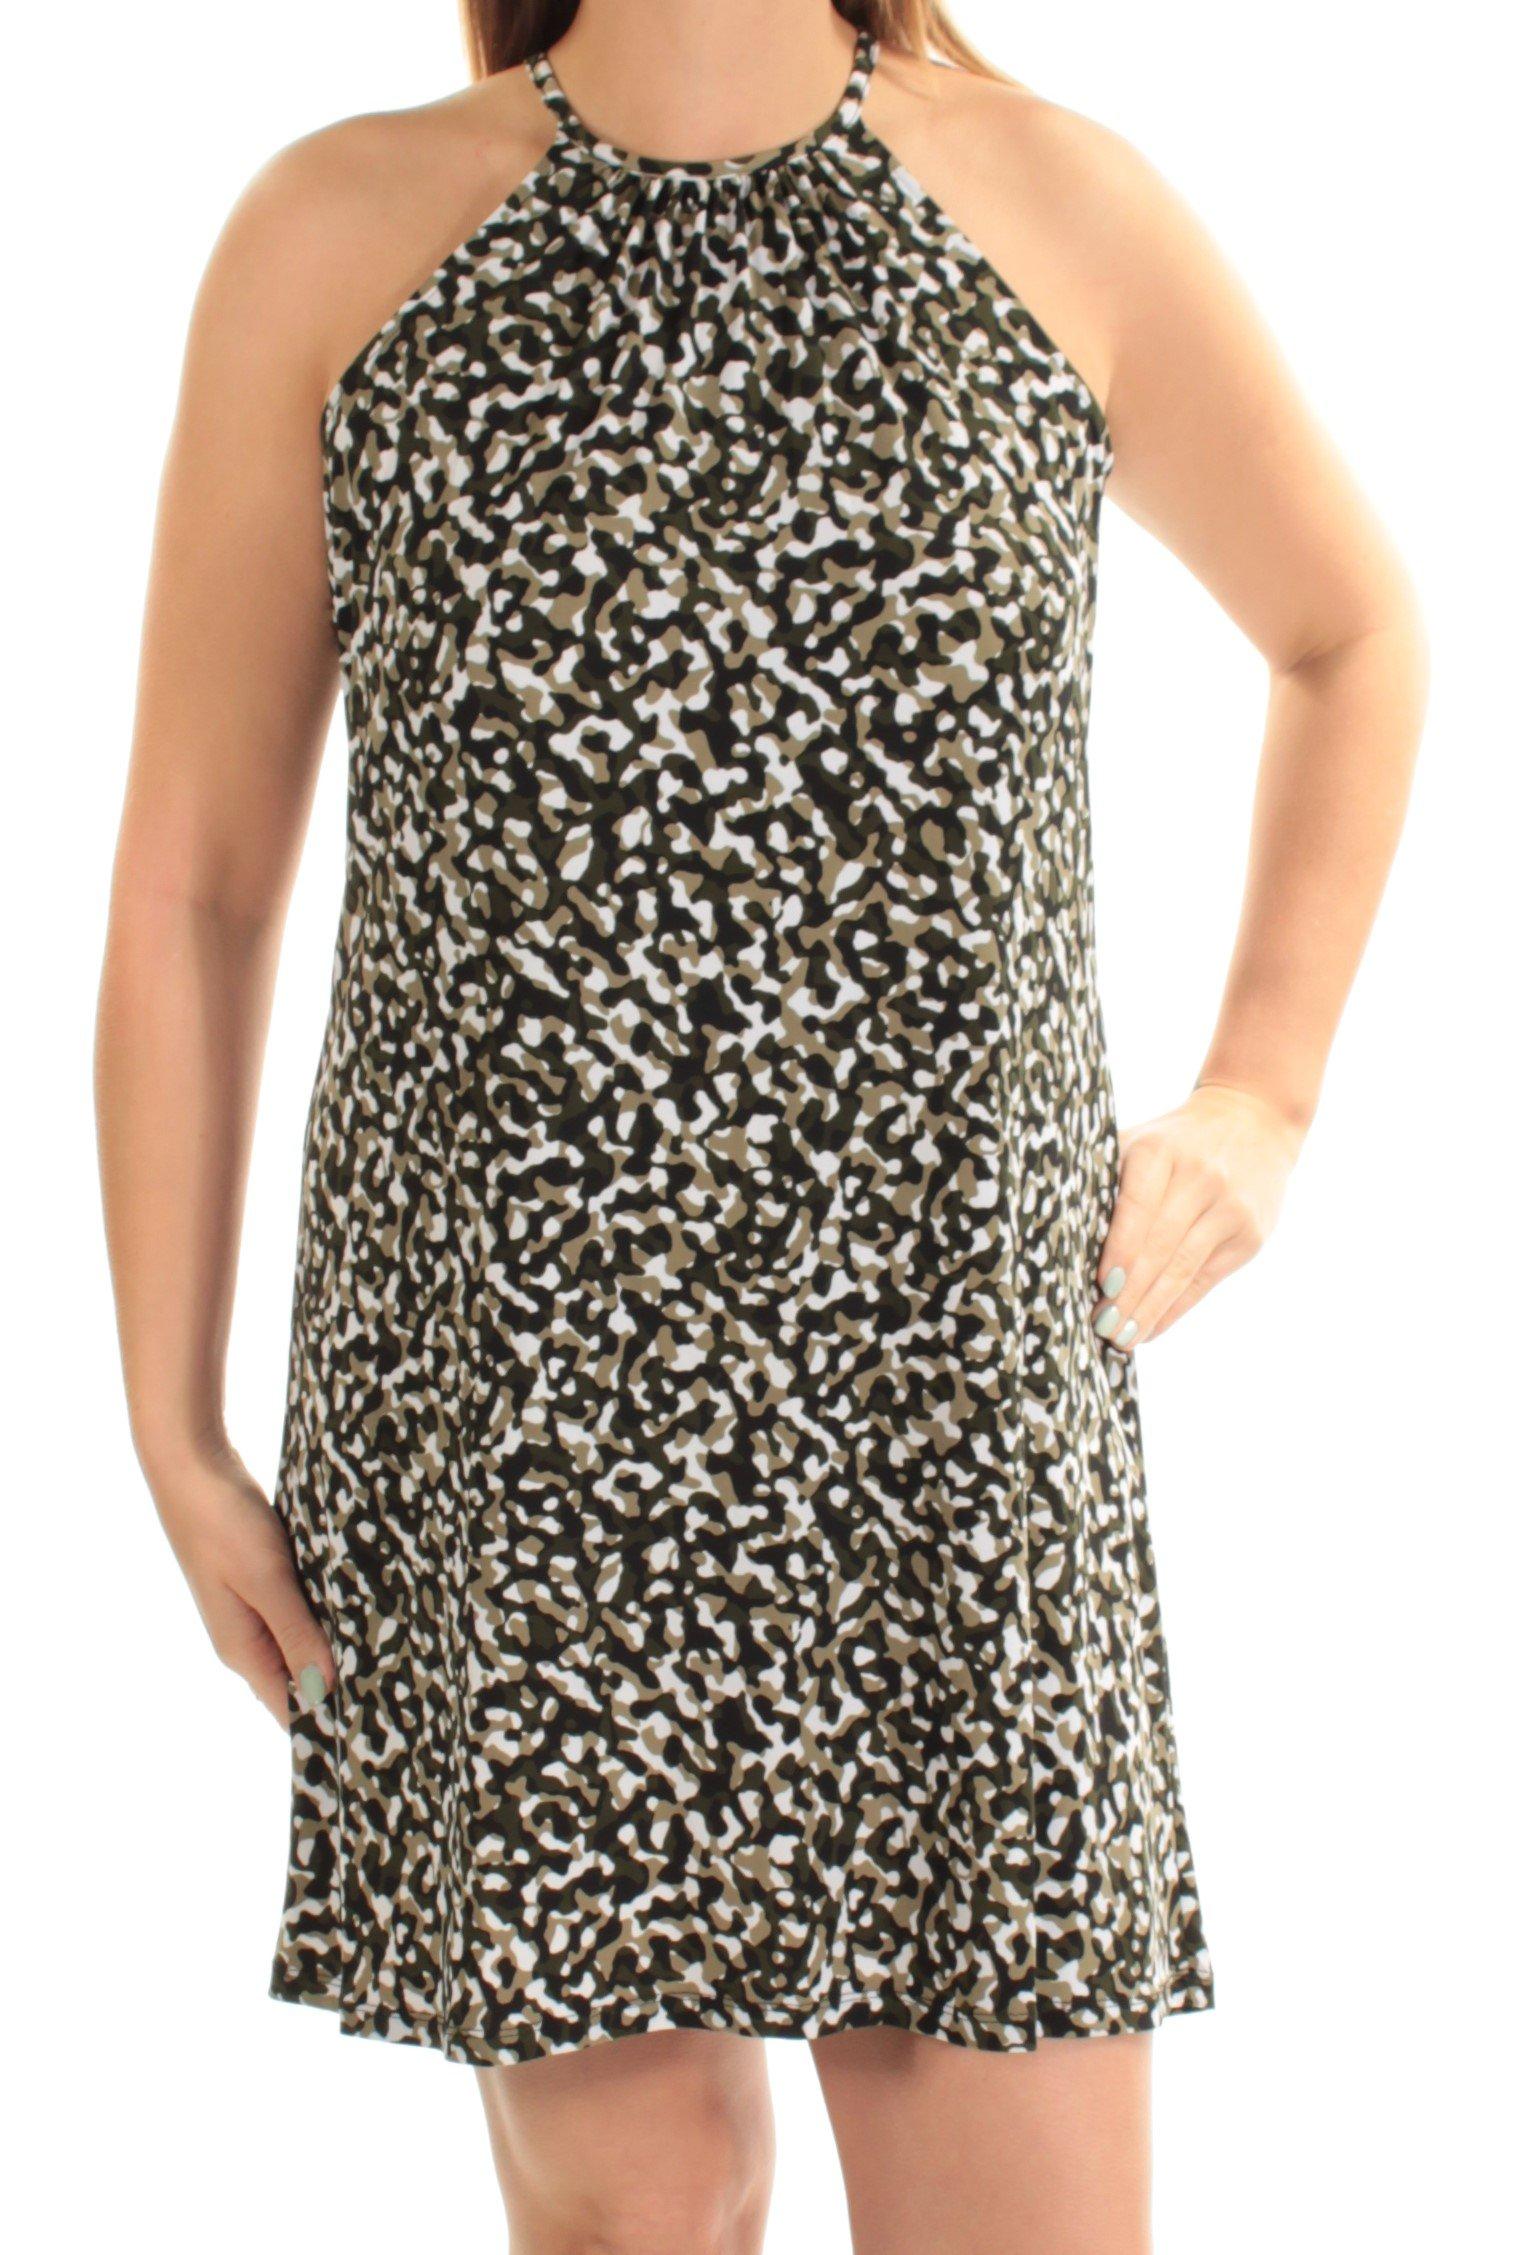 Michael Kors Women's Large Petite Camo Print Sheath Dress Green PL